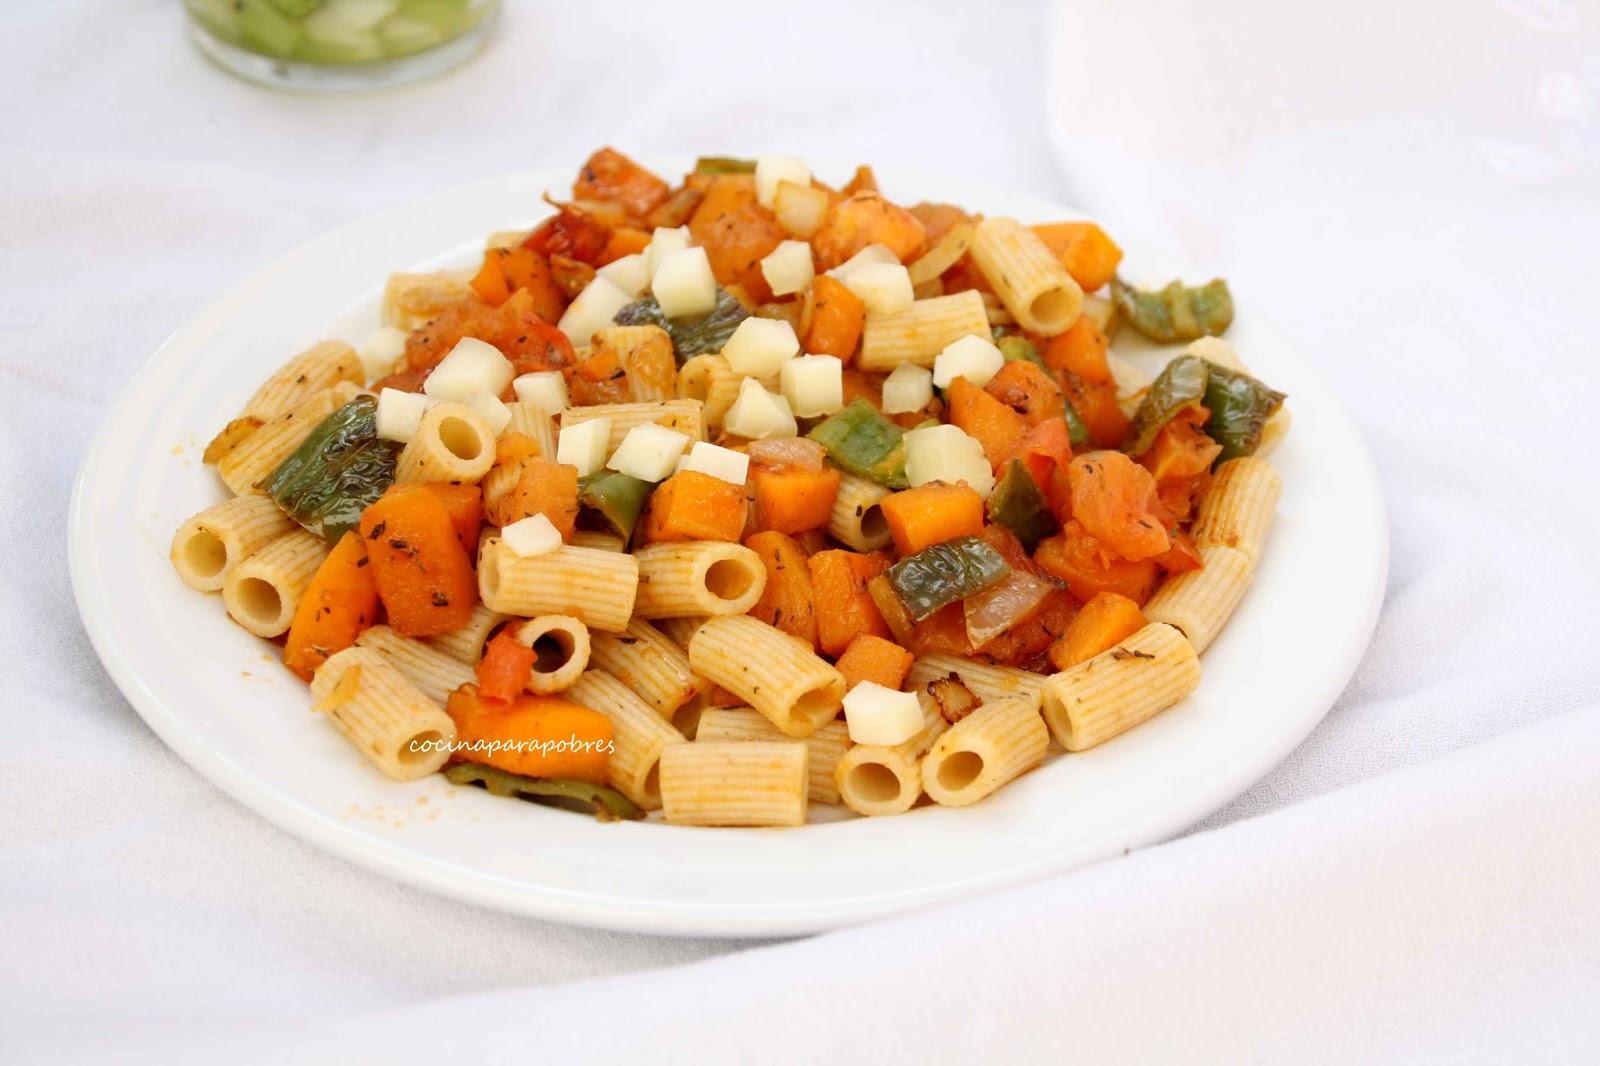 Cocina para pobres: Macarrones integrales con verduras